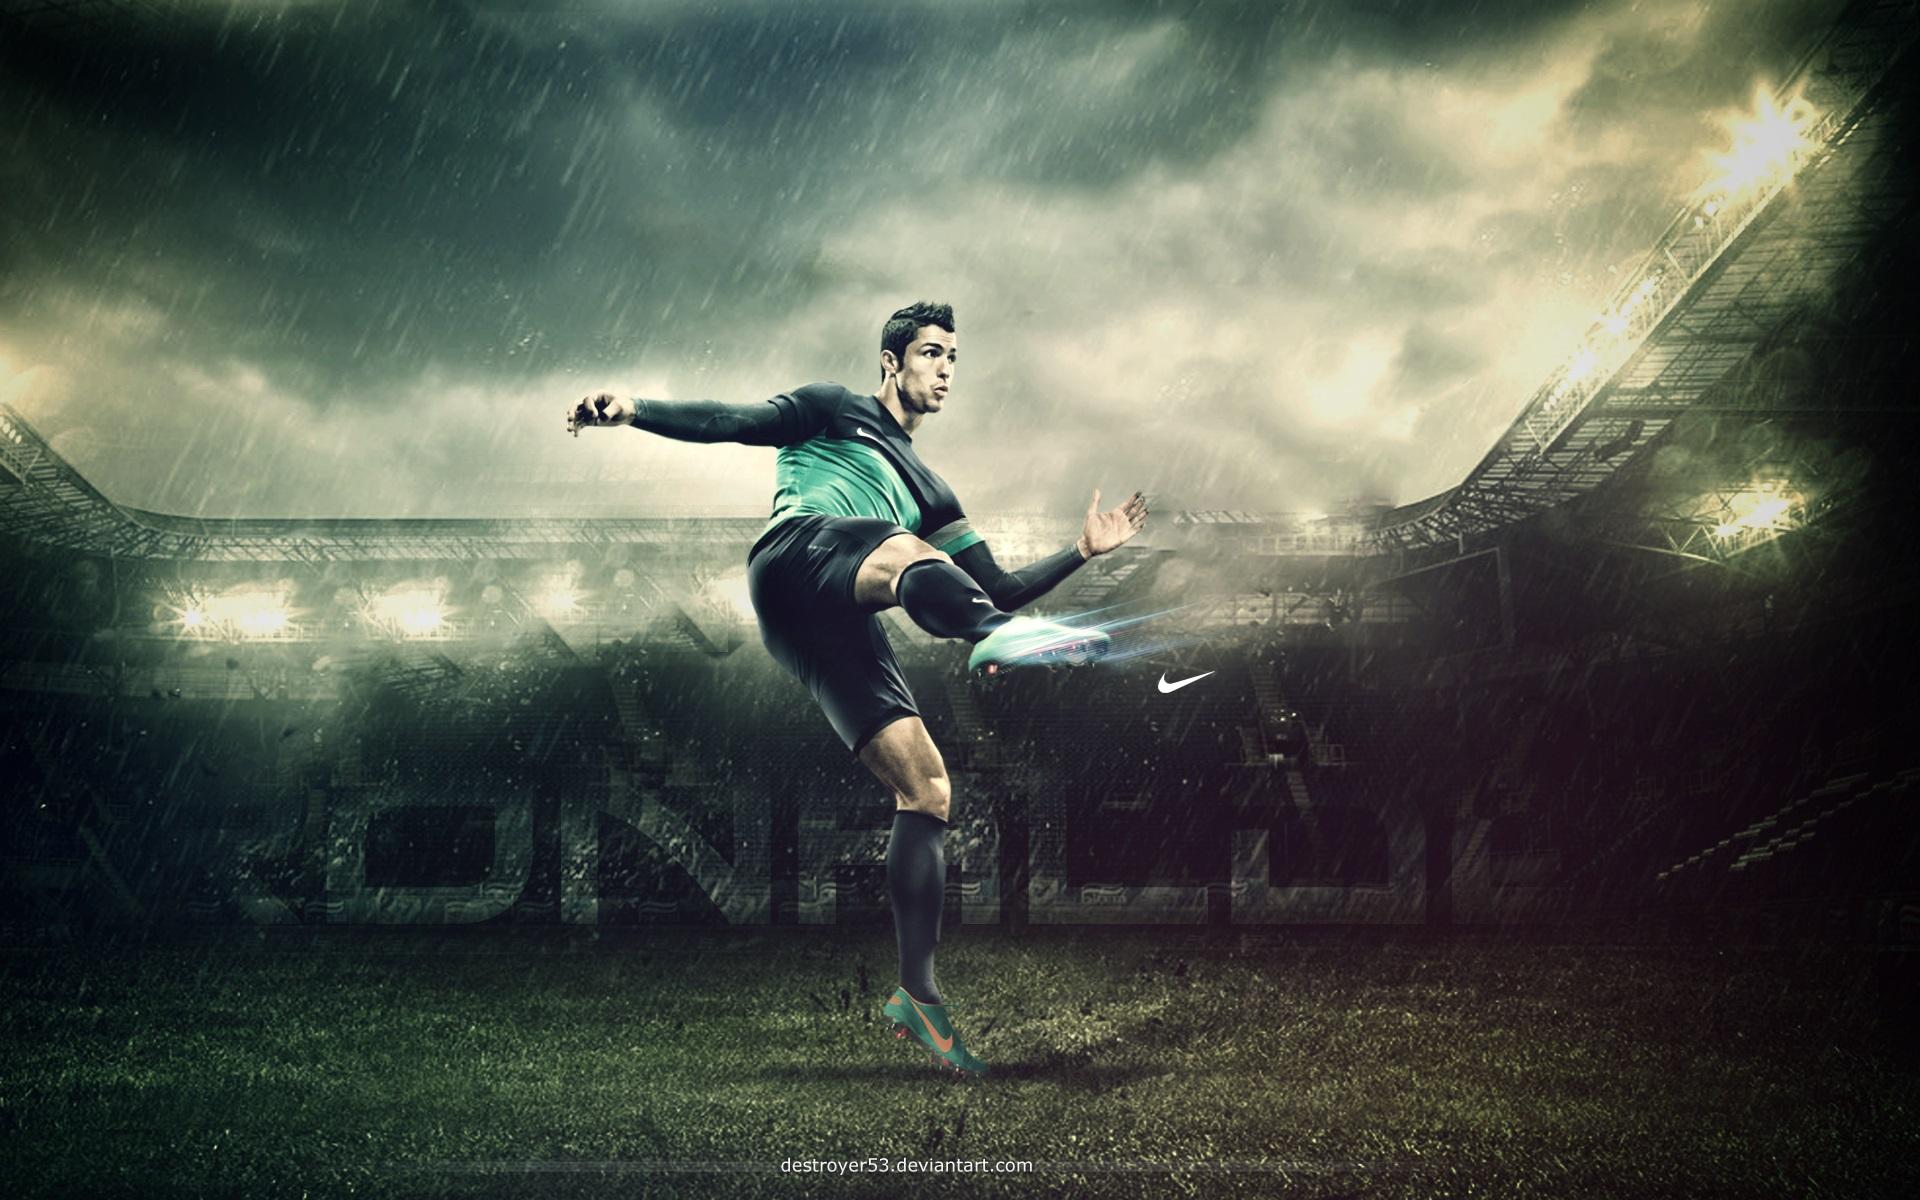 Jack Daniels Wallpaper For Iphone Cristiano Ronaldo Wallpaper Nike Images Wallpaper And